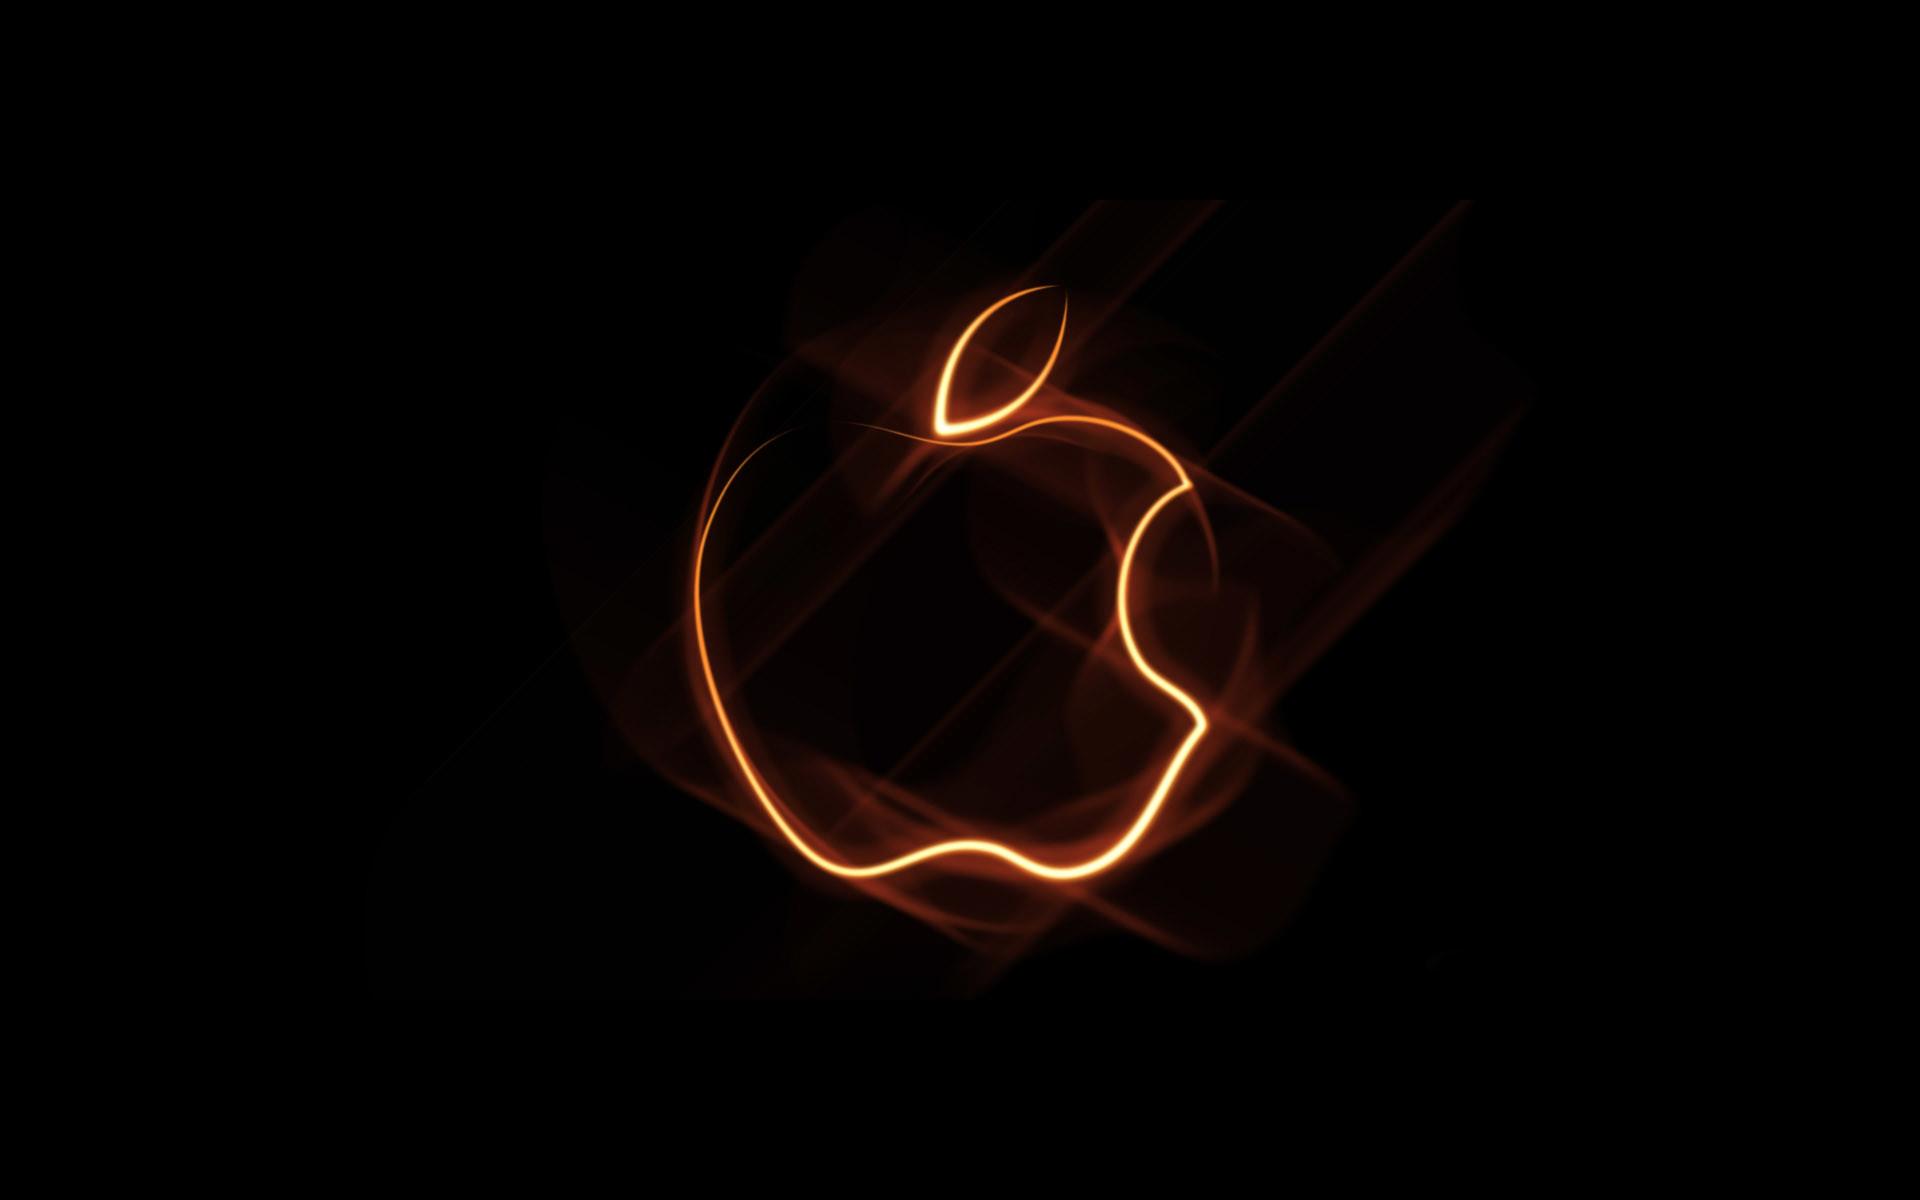 Res: 1920x1200, apple logo image